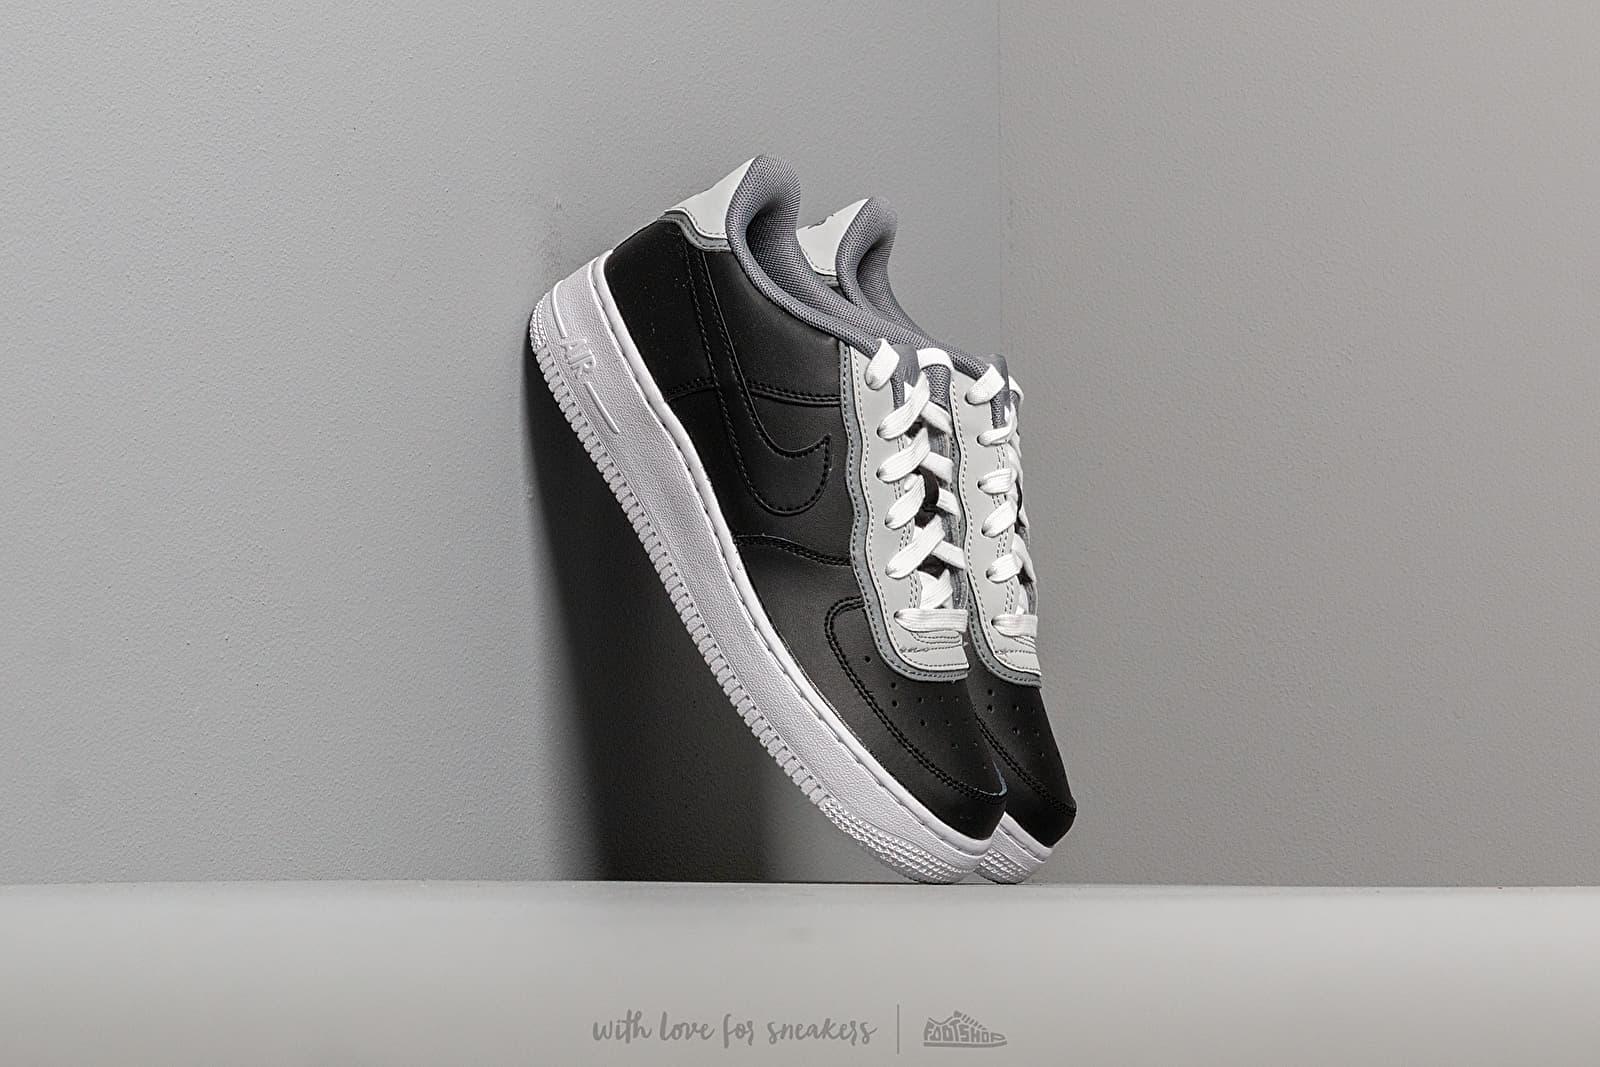 Nike Air Force 1 Lv8 1 Double GS Black/ Black-Pure Platinum-Cool Grey za skvělou cenu 2 190 Kč koupíte na Footshop.cz